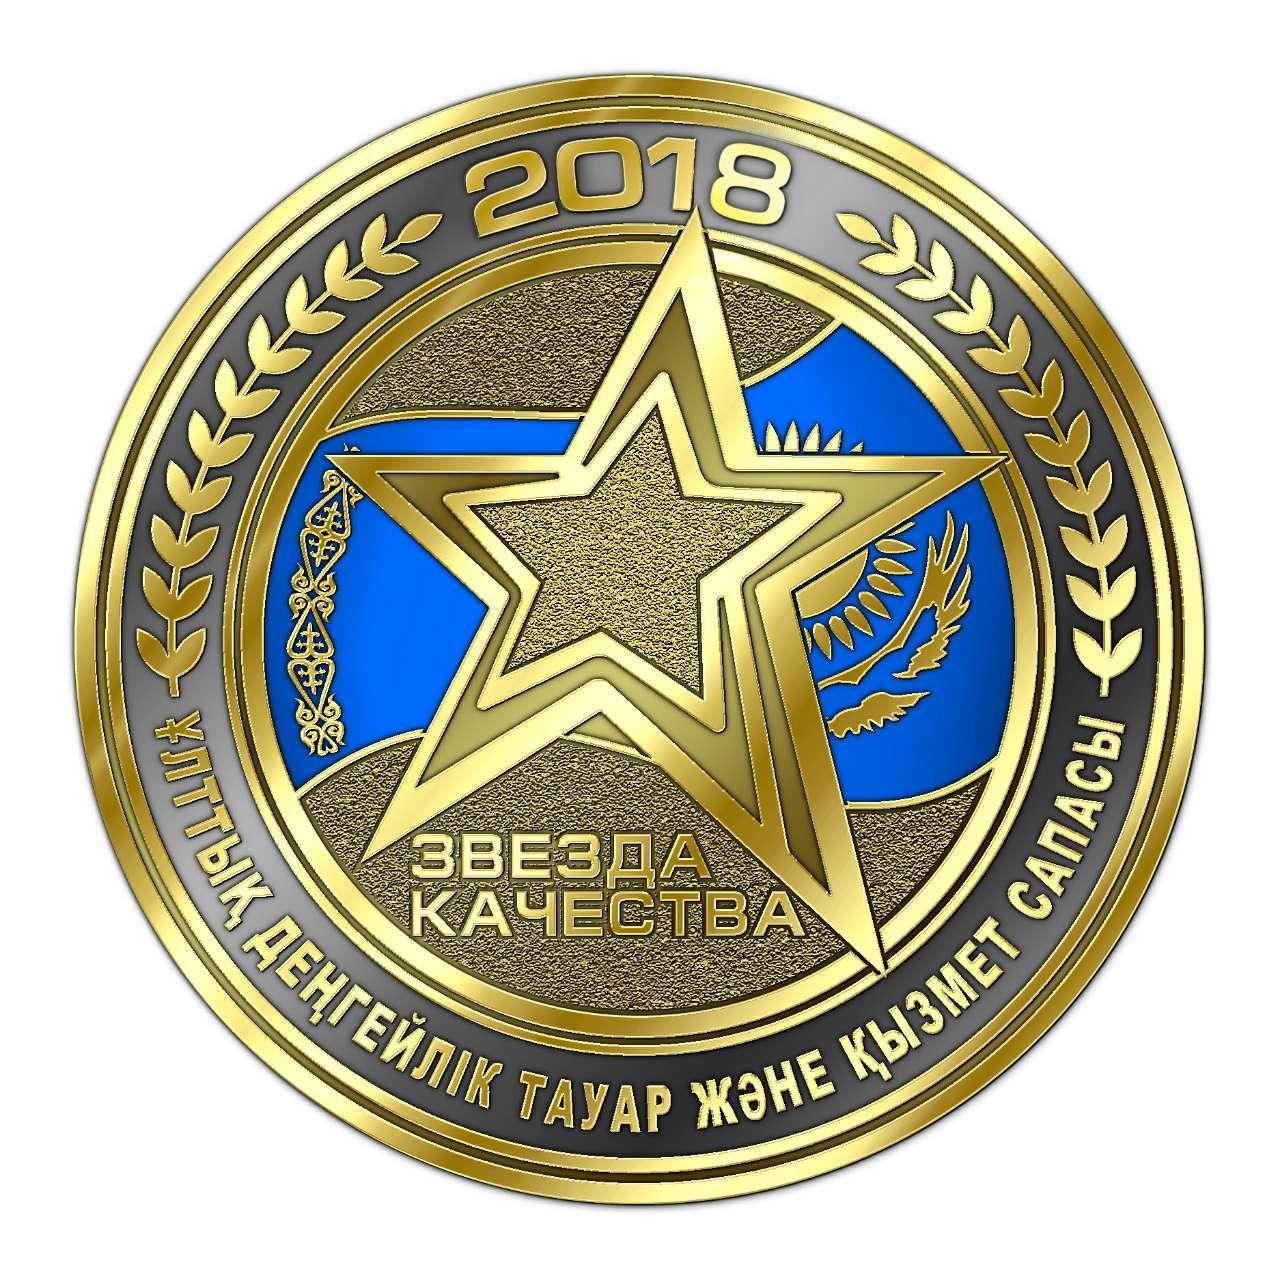 Звезда качества 2018